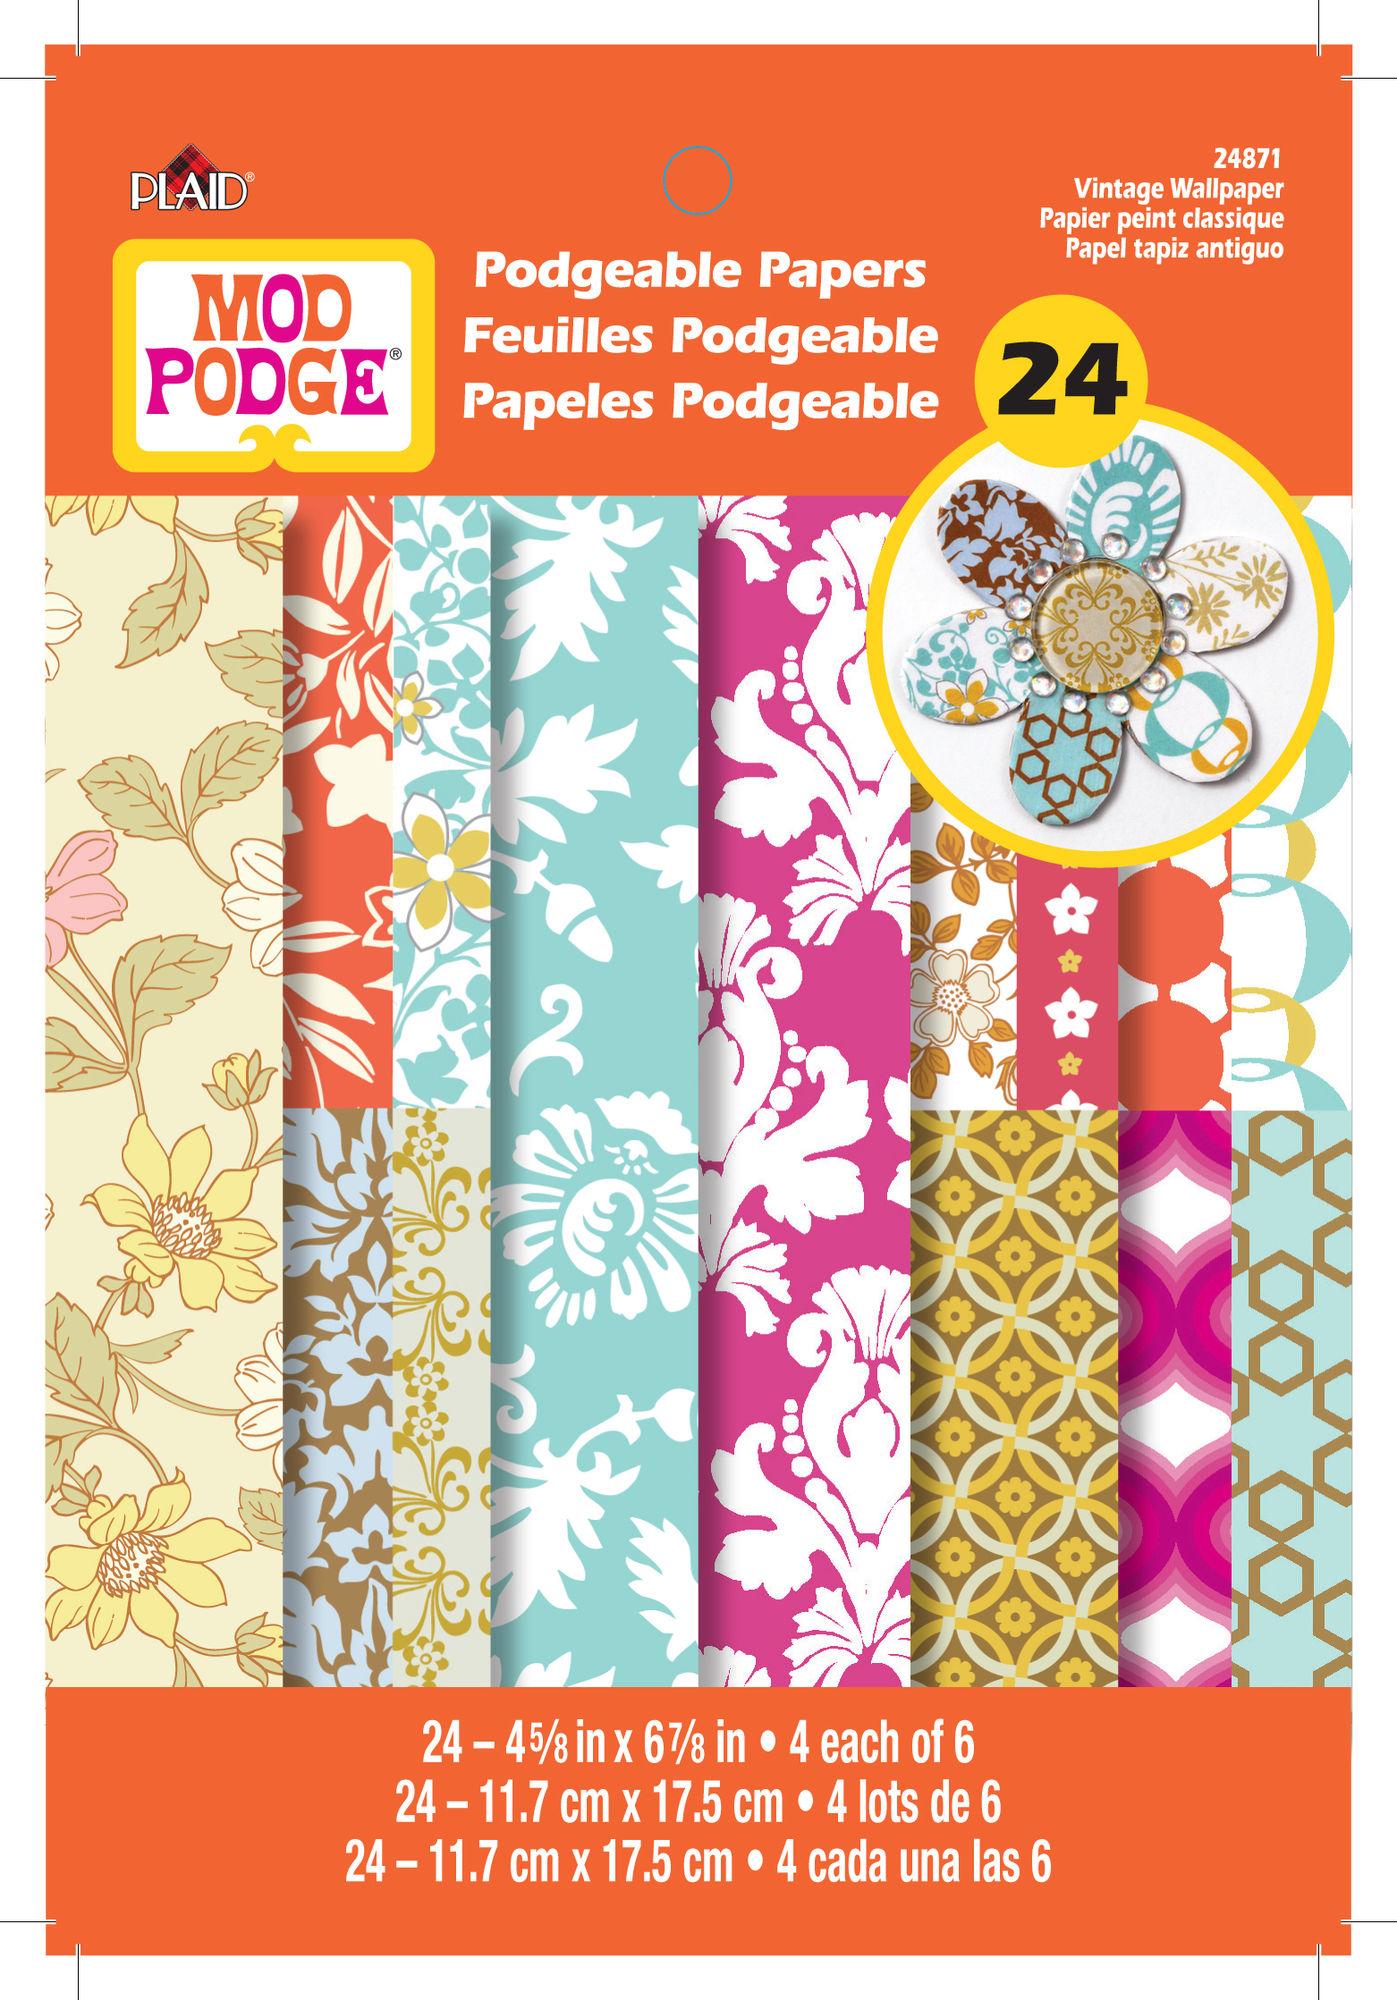 Mod Podge 24pc Papers   Vintage Wallpaper 1397x2000